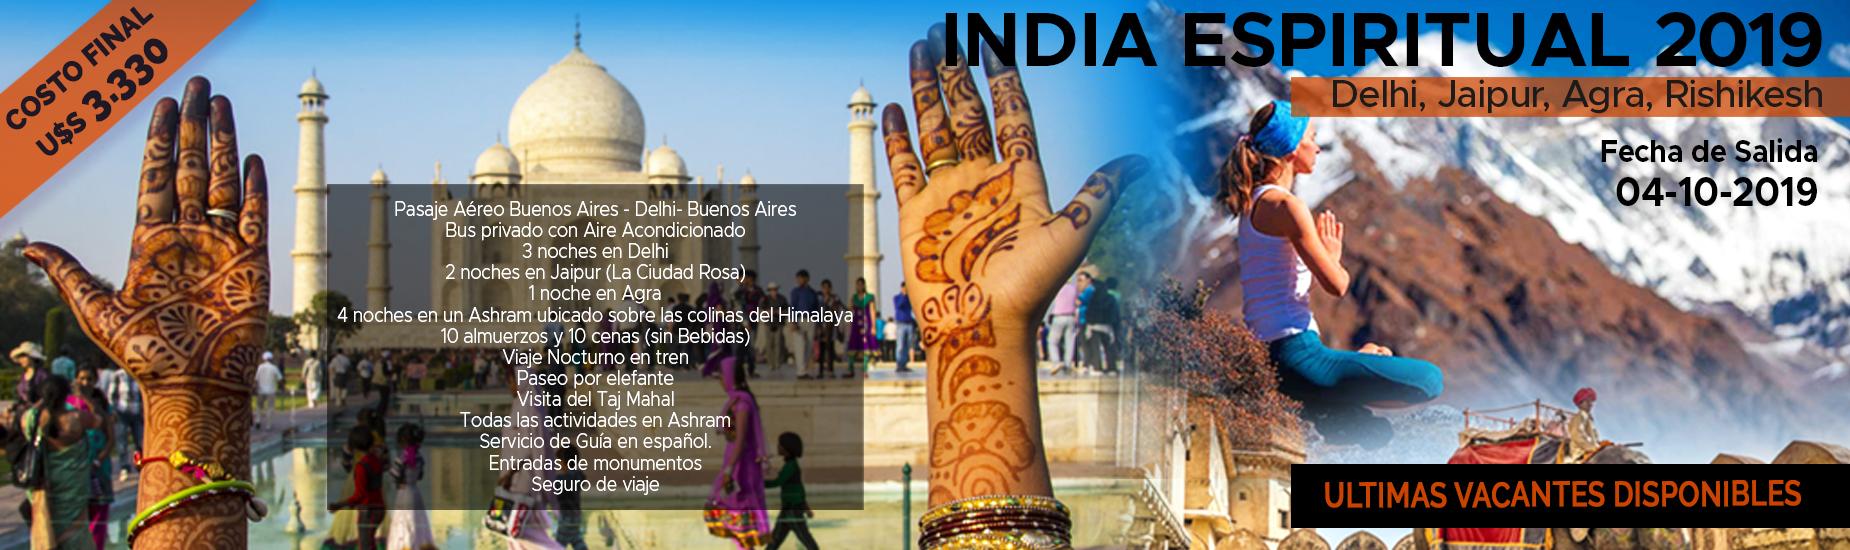 VIAJES 2019 - India Espiritual 2019 - opcion2